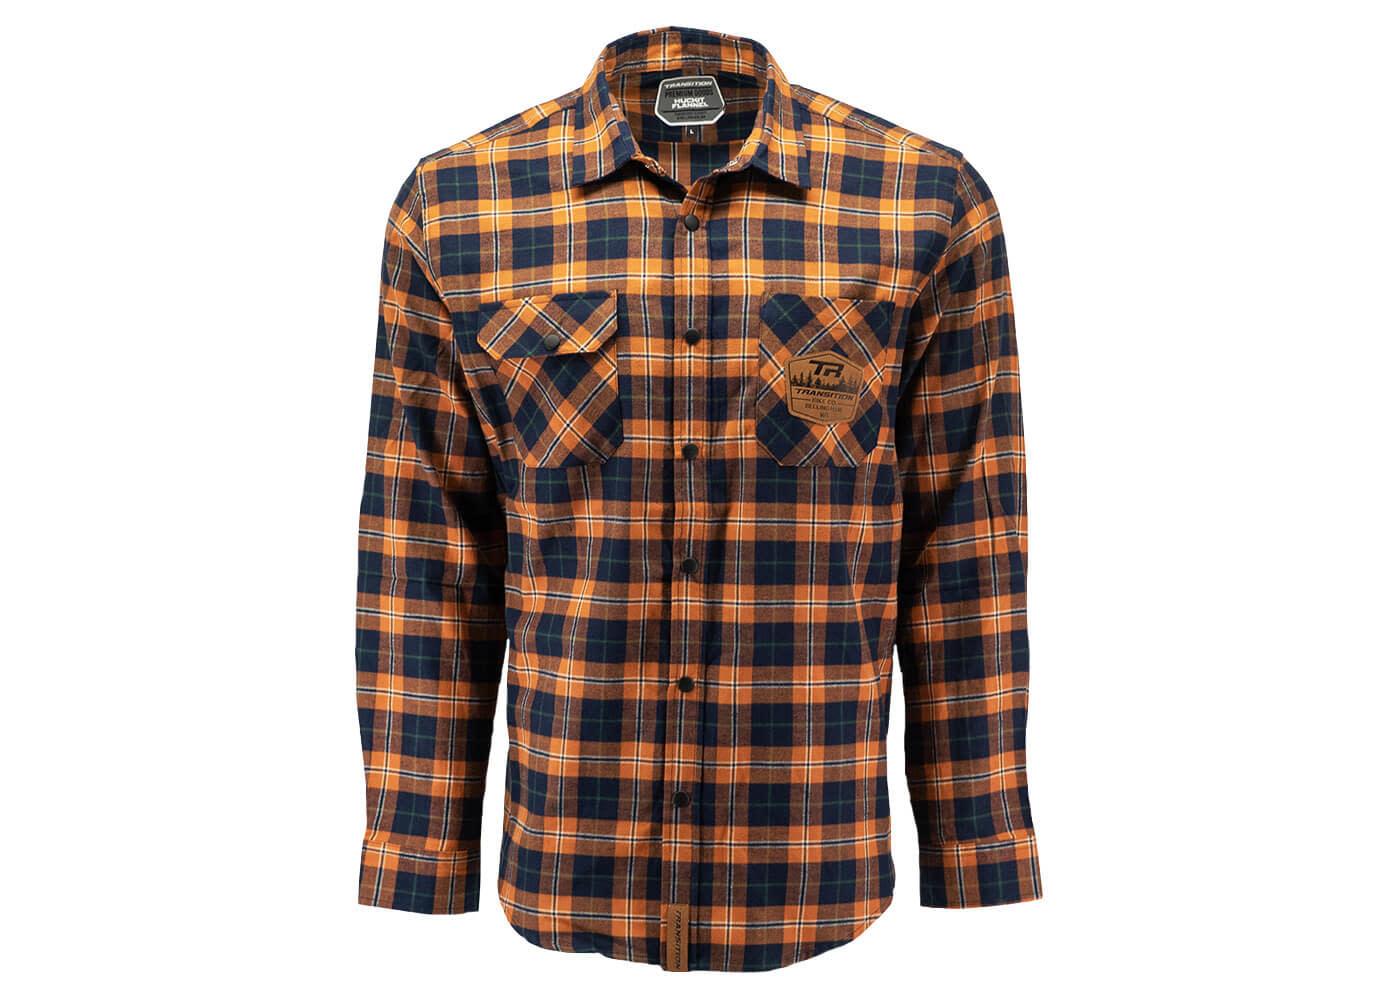 Transition TBC - Huckit Flannel (Autumn Orange Plaid, Small)